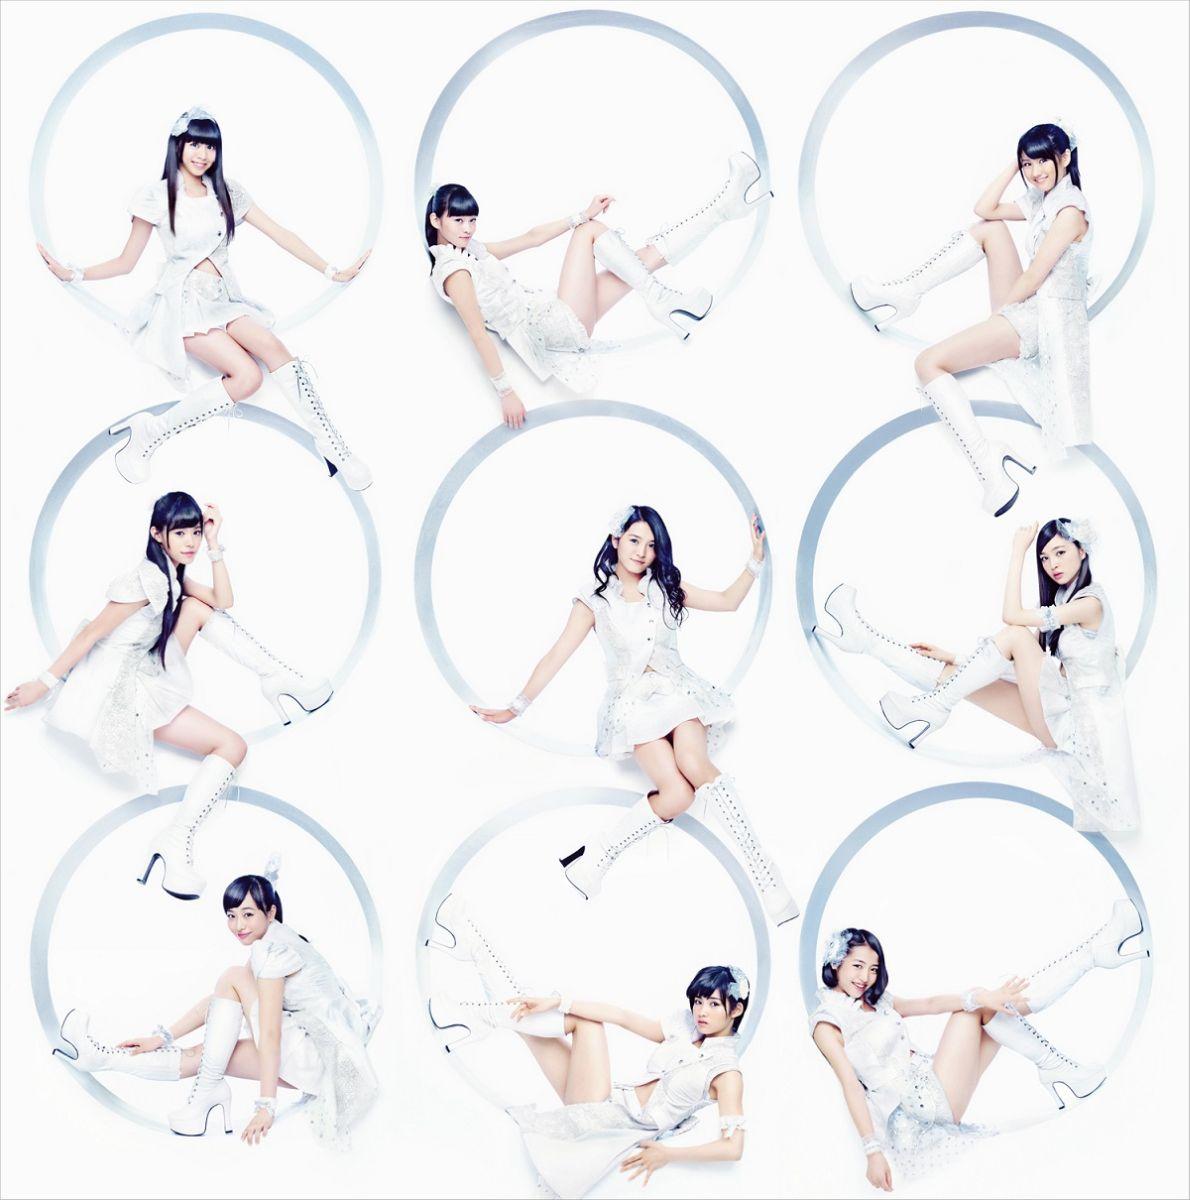 DREAM TRIGGER (初回限定盤A CD+DVD) [ 東京パフォーマンスドール ]